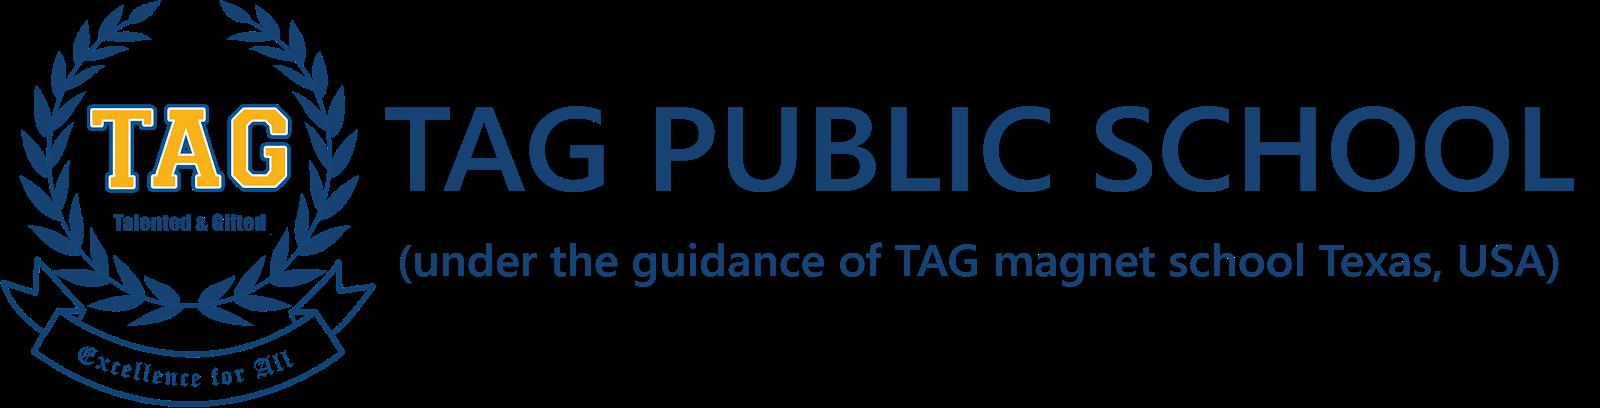 TAG PUBLIC SCHOOL